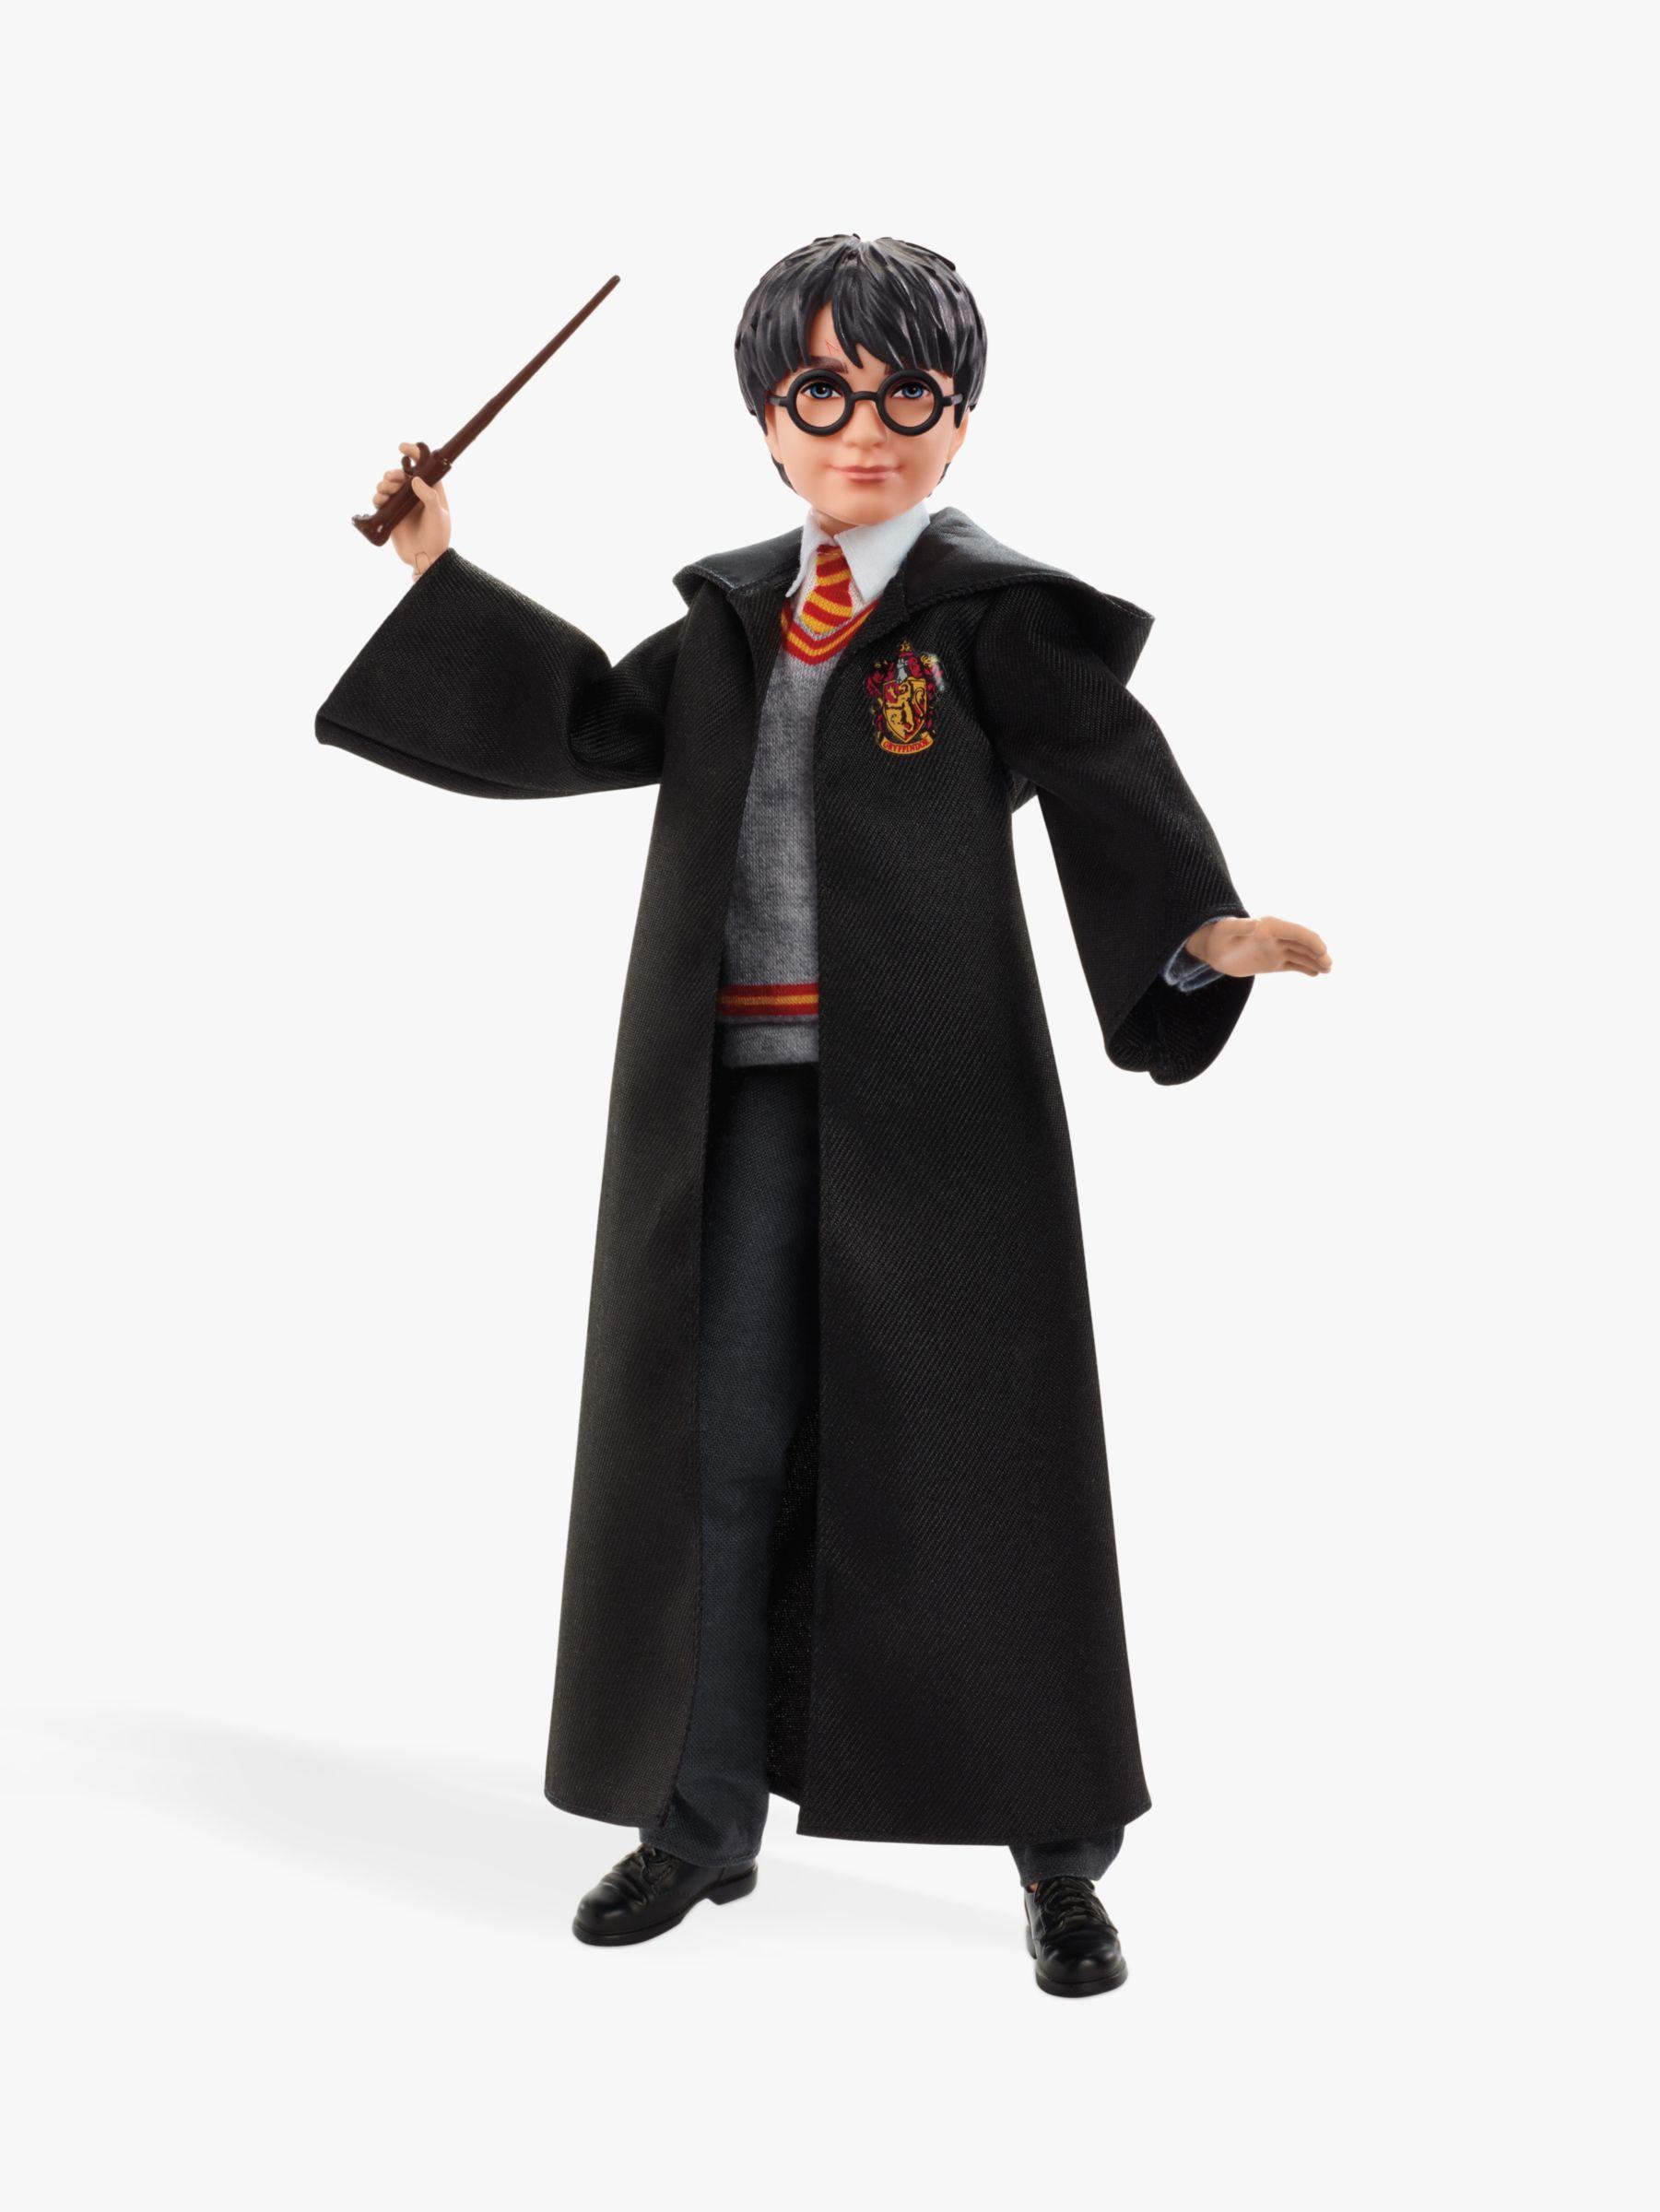 Harry Potter Harry Potter Action Figure